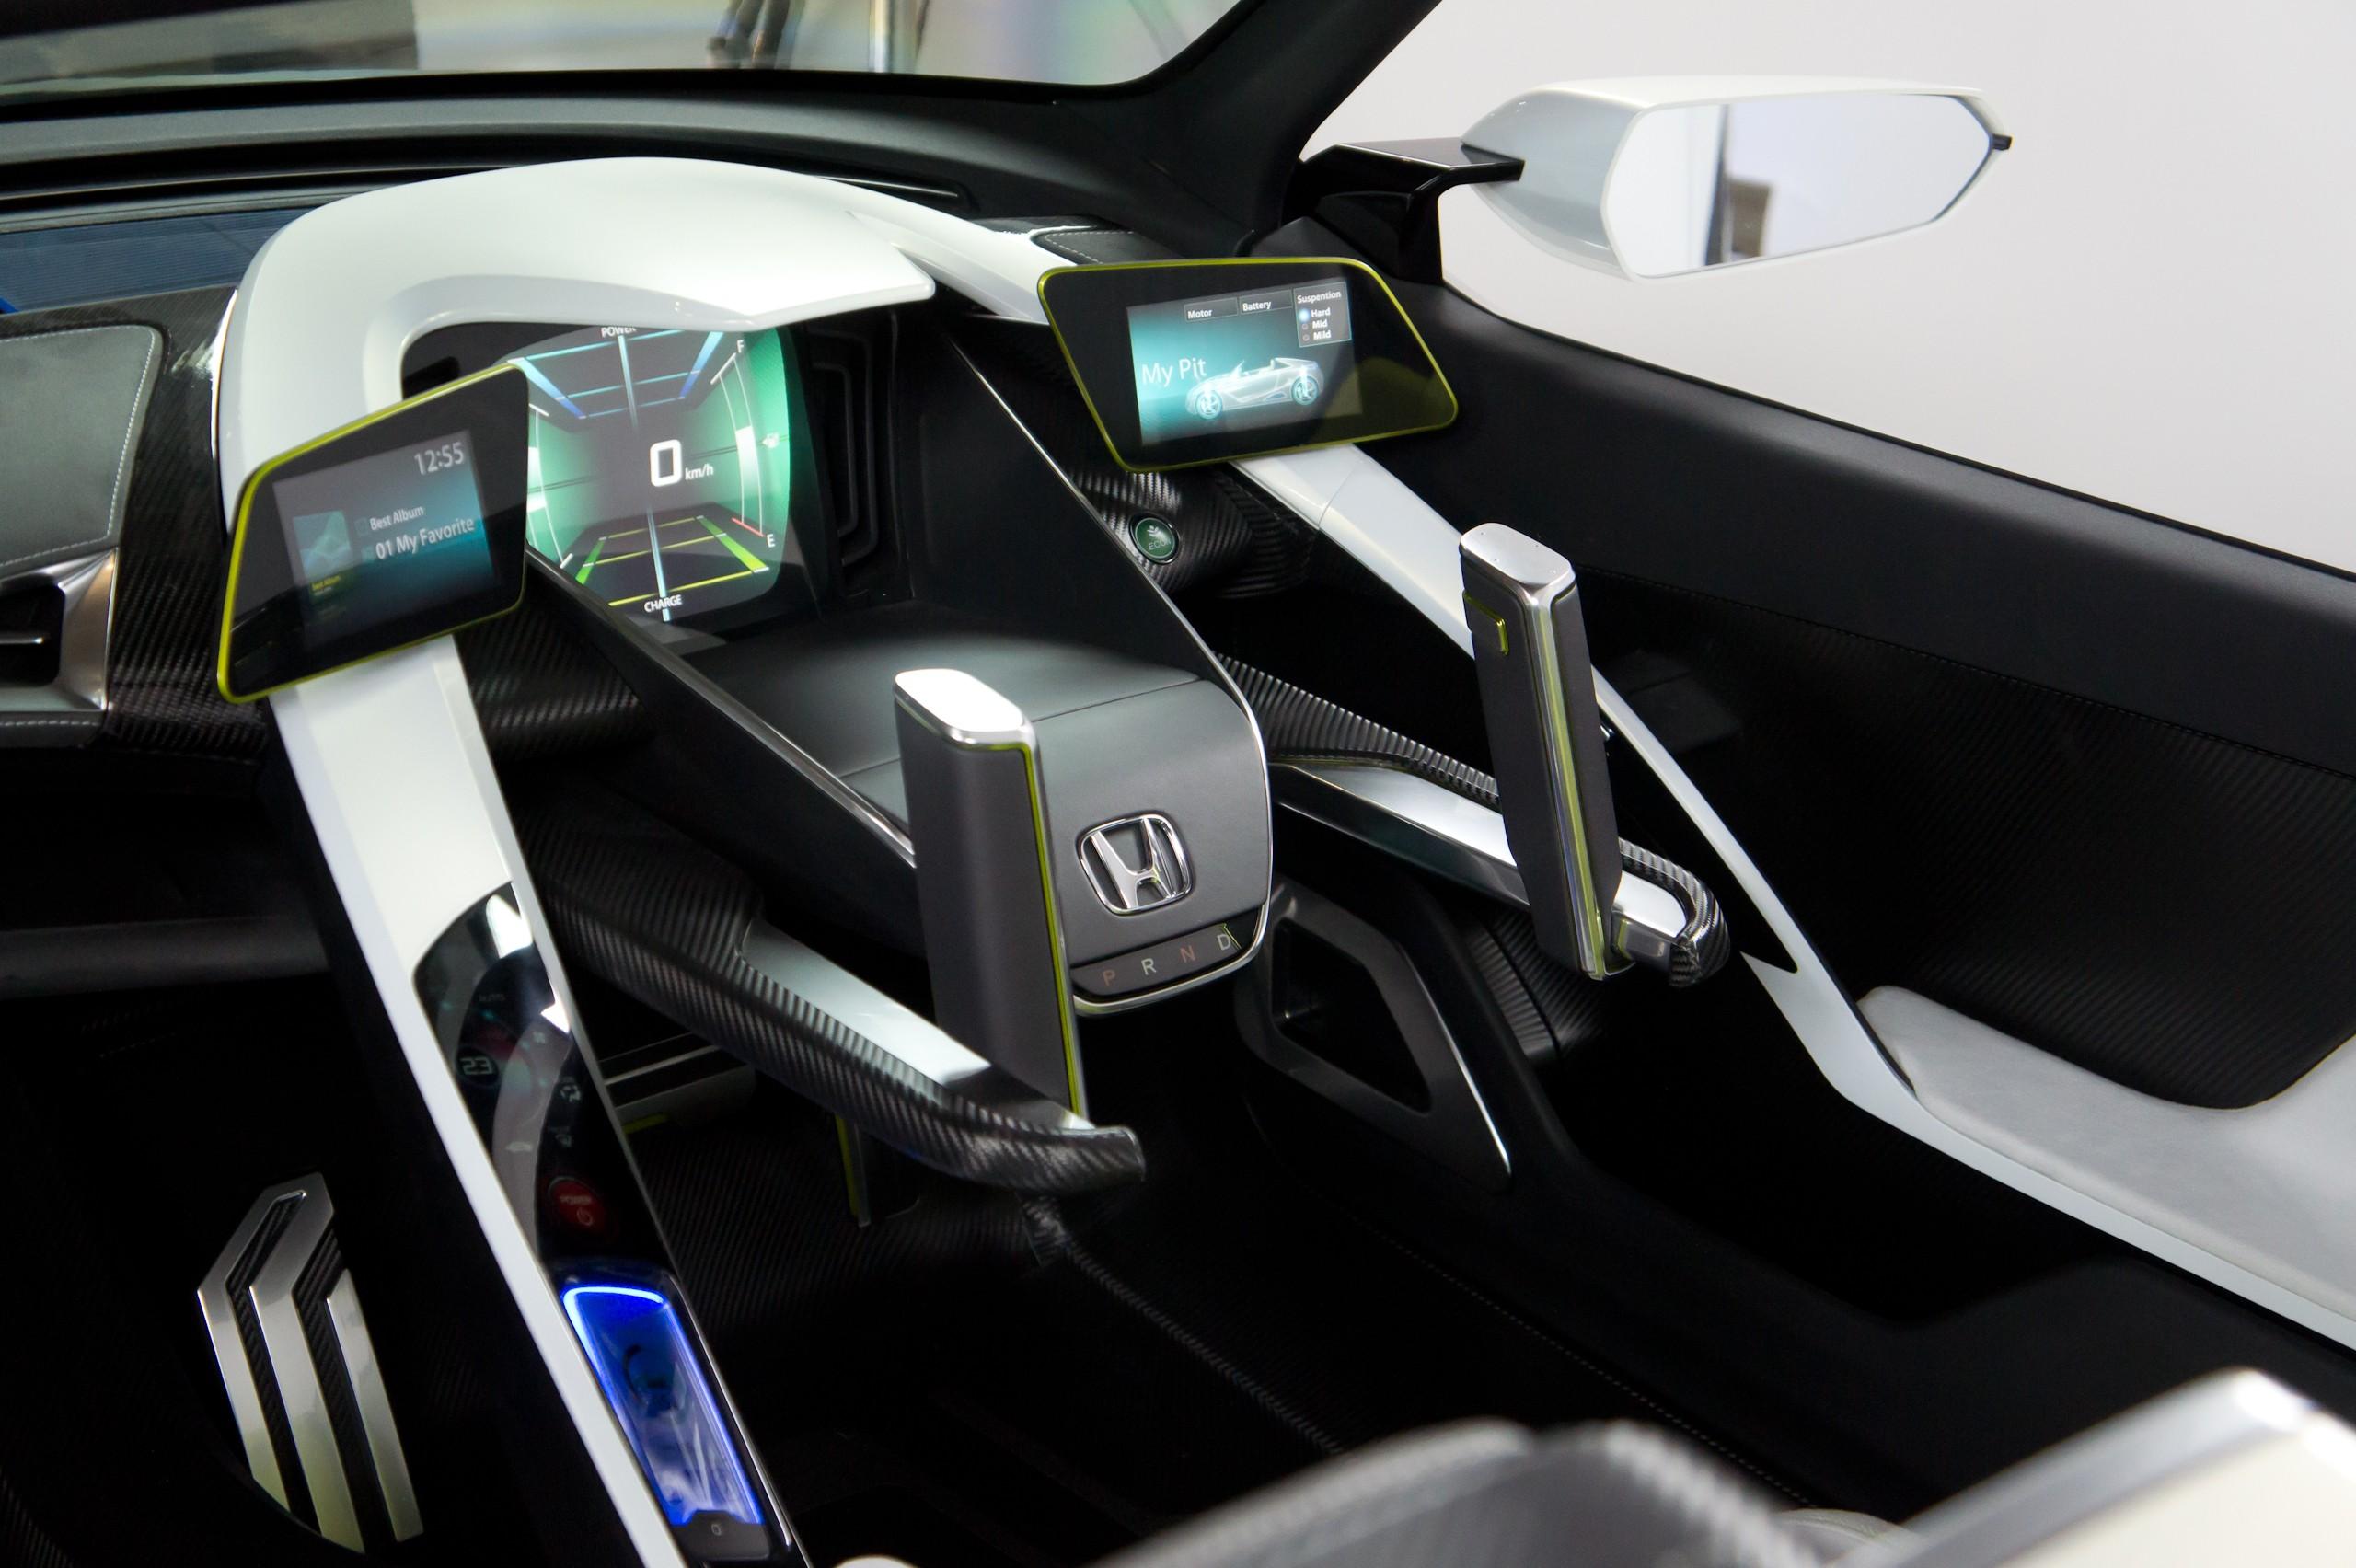 Driving Hand Controls Car